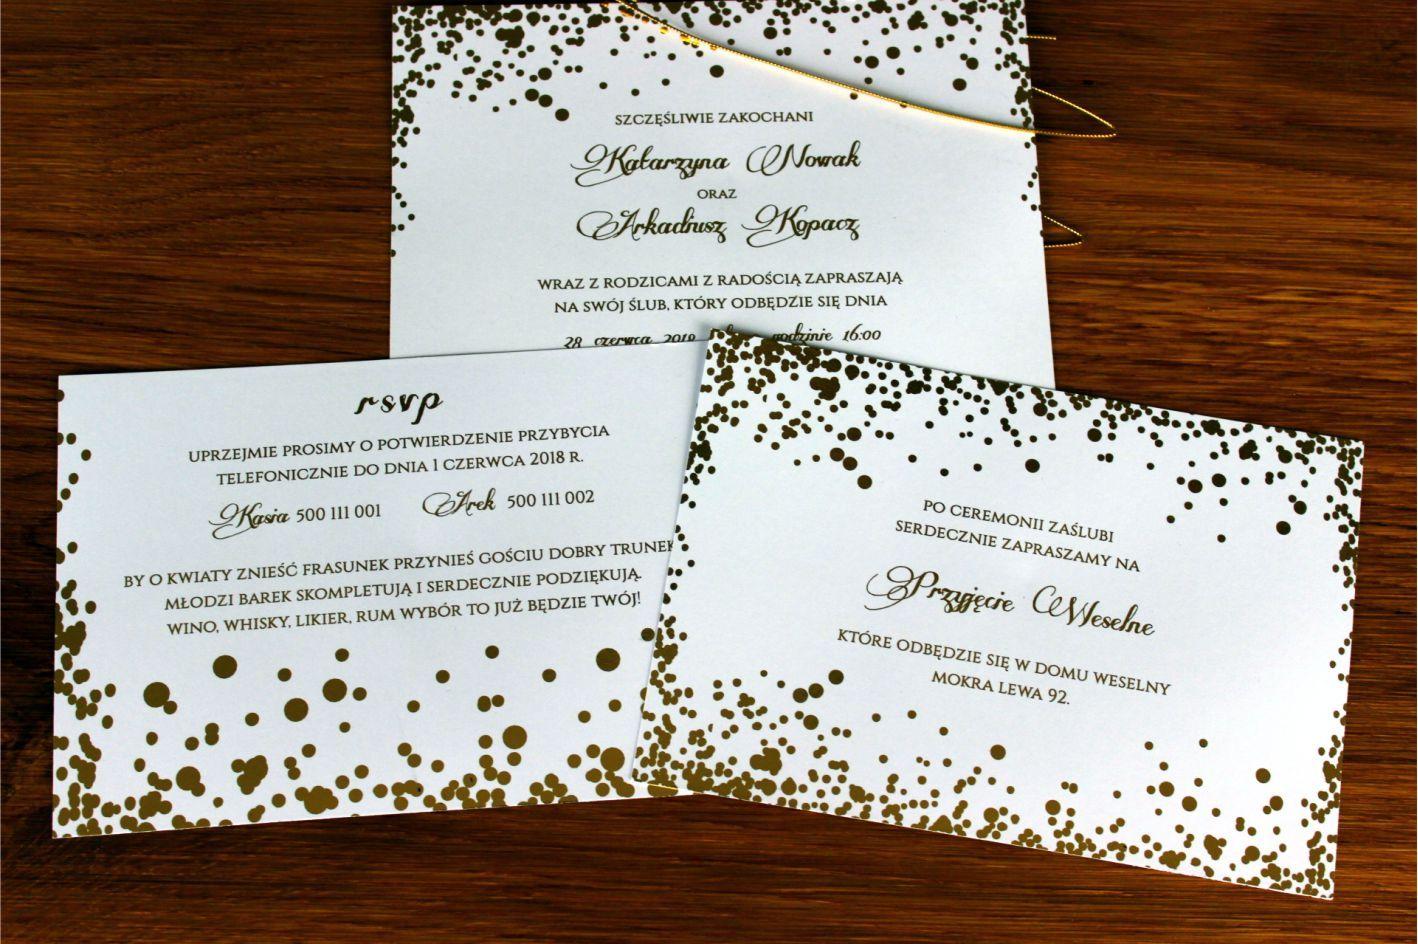 Pin By Anna Bazarkowska On Zaproszenia Slubne Event Event Ticket Gold